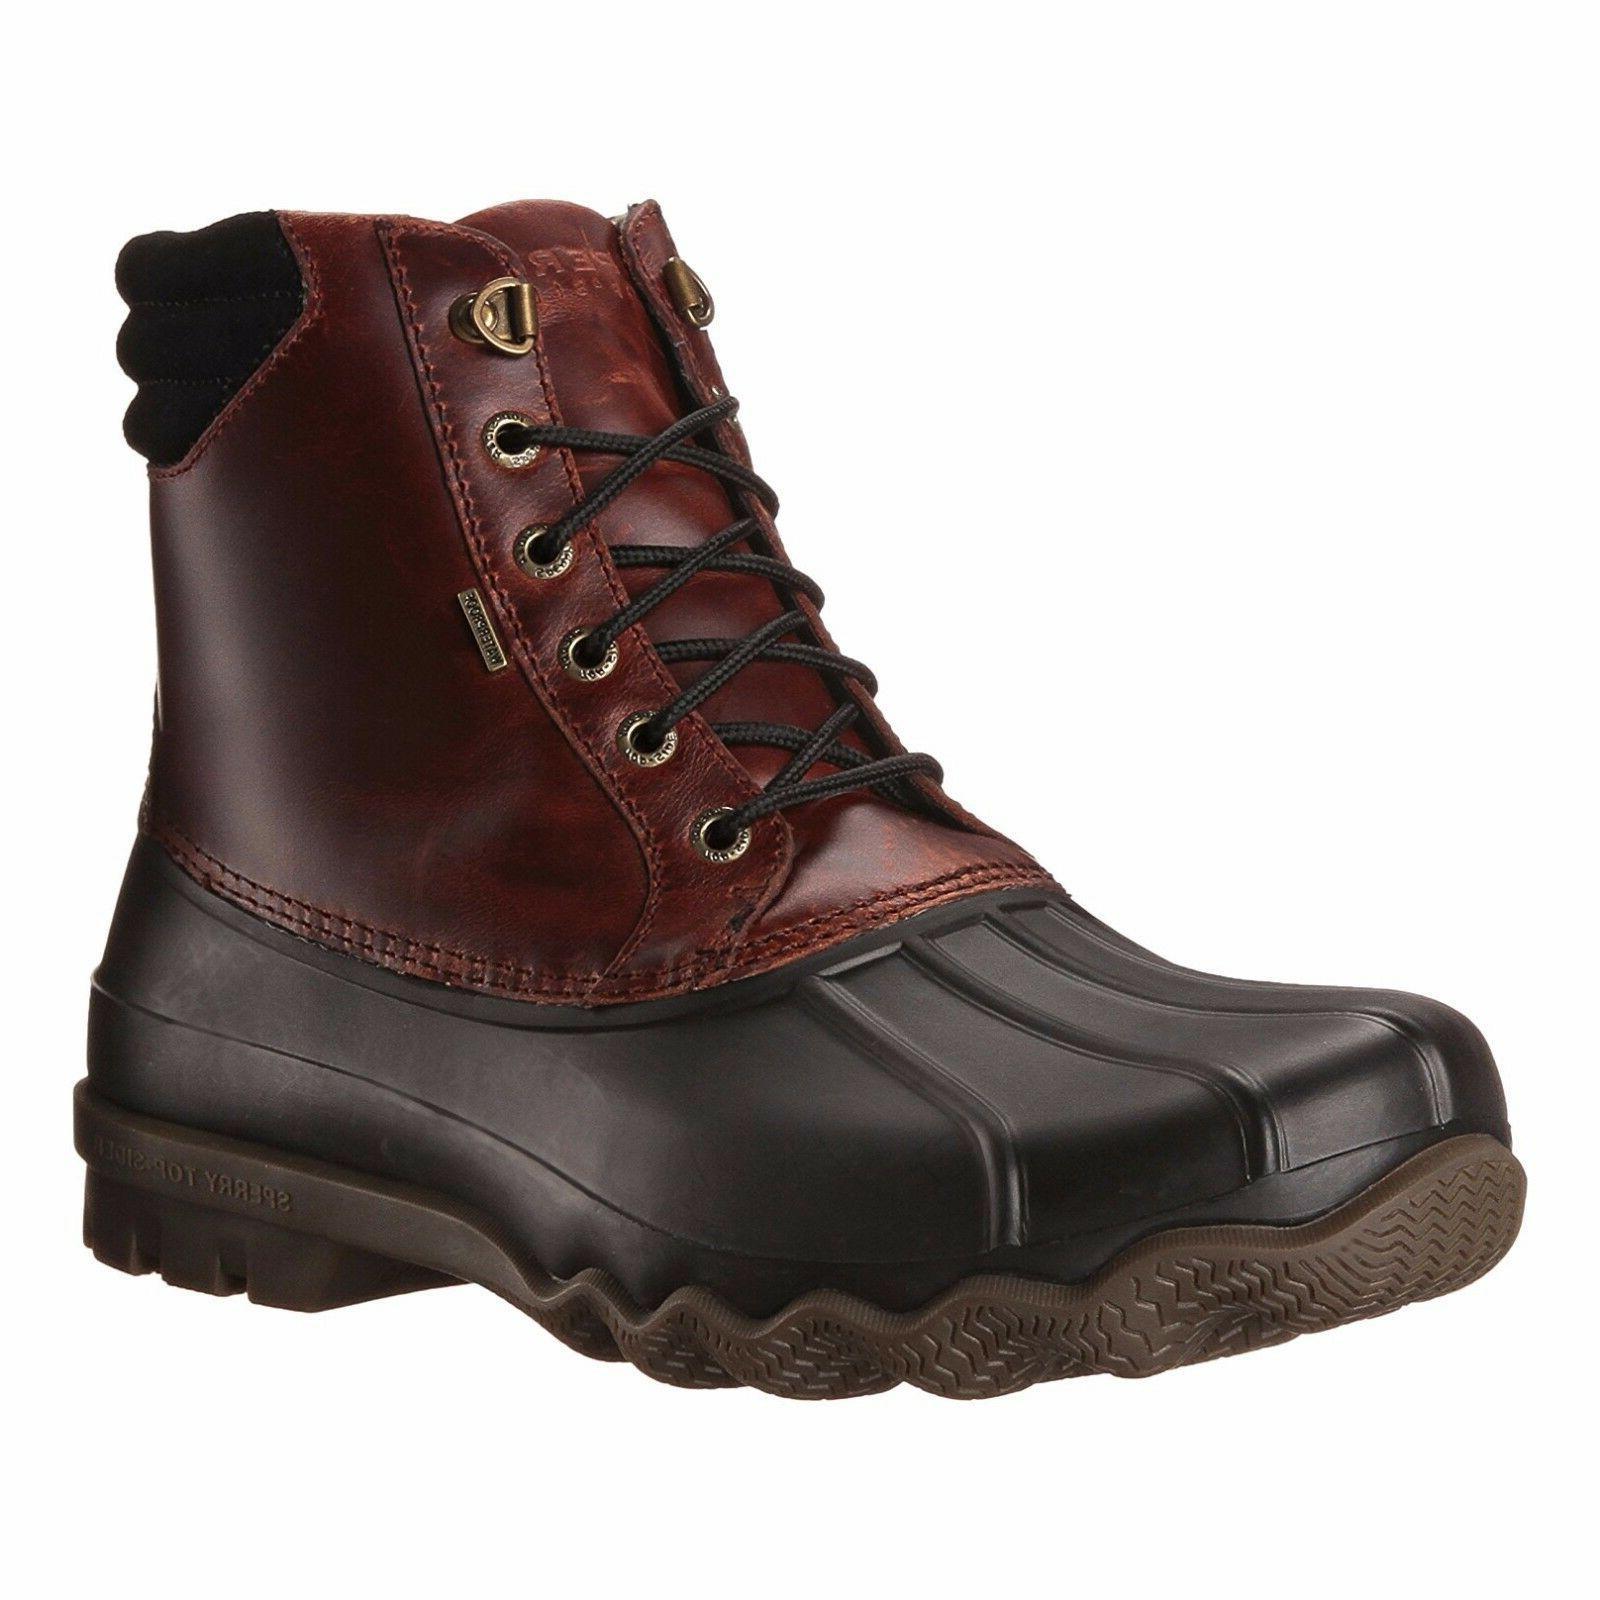 Sperry Top-Sider Men's Avenue Duck Boot Chukka Winter Boot B